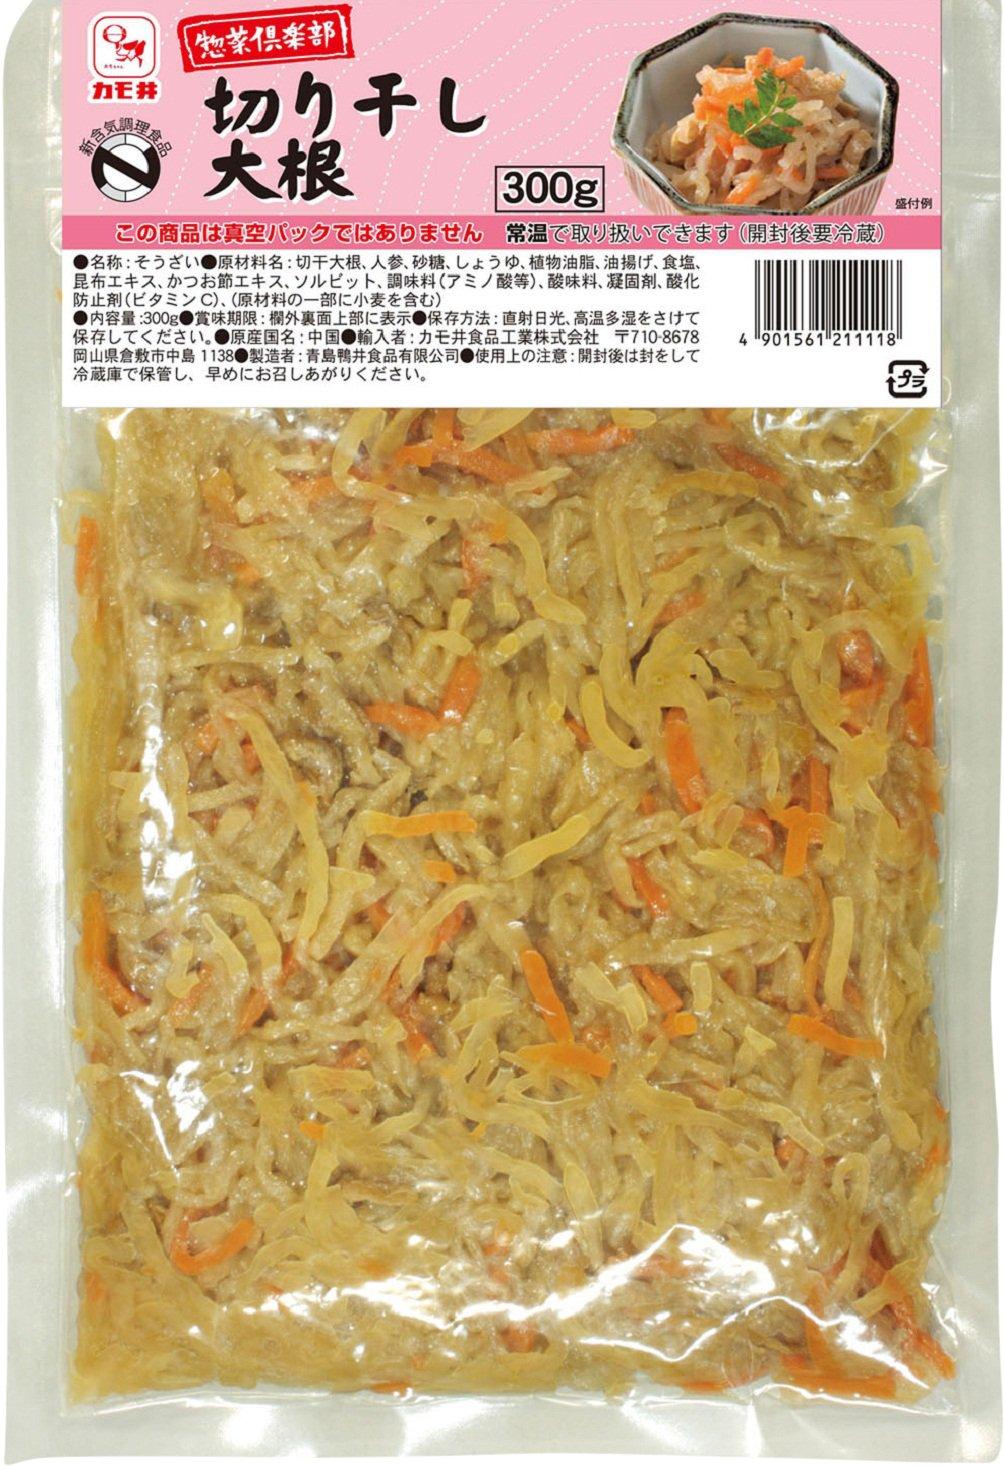 300gX10 bags duck well food delicatessen club dried daikon strips radish